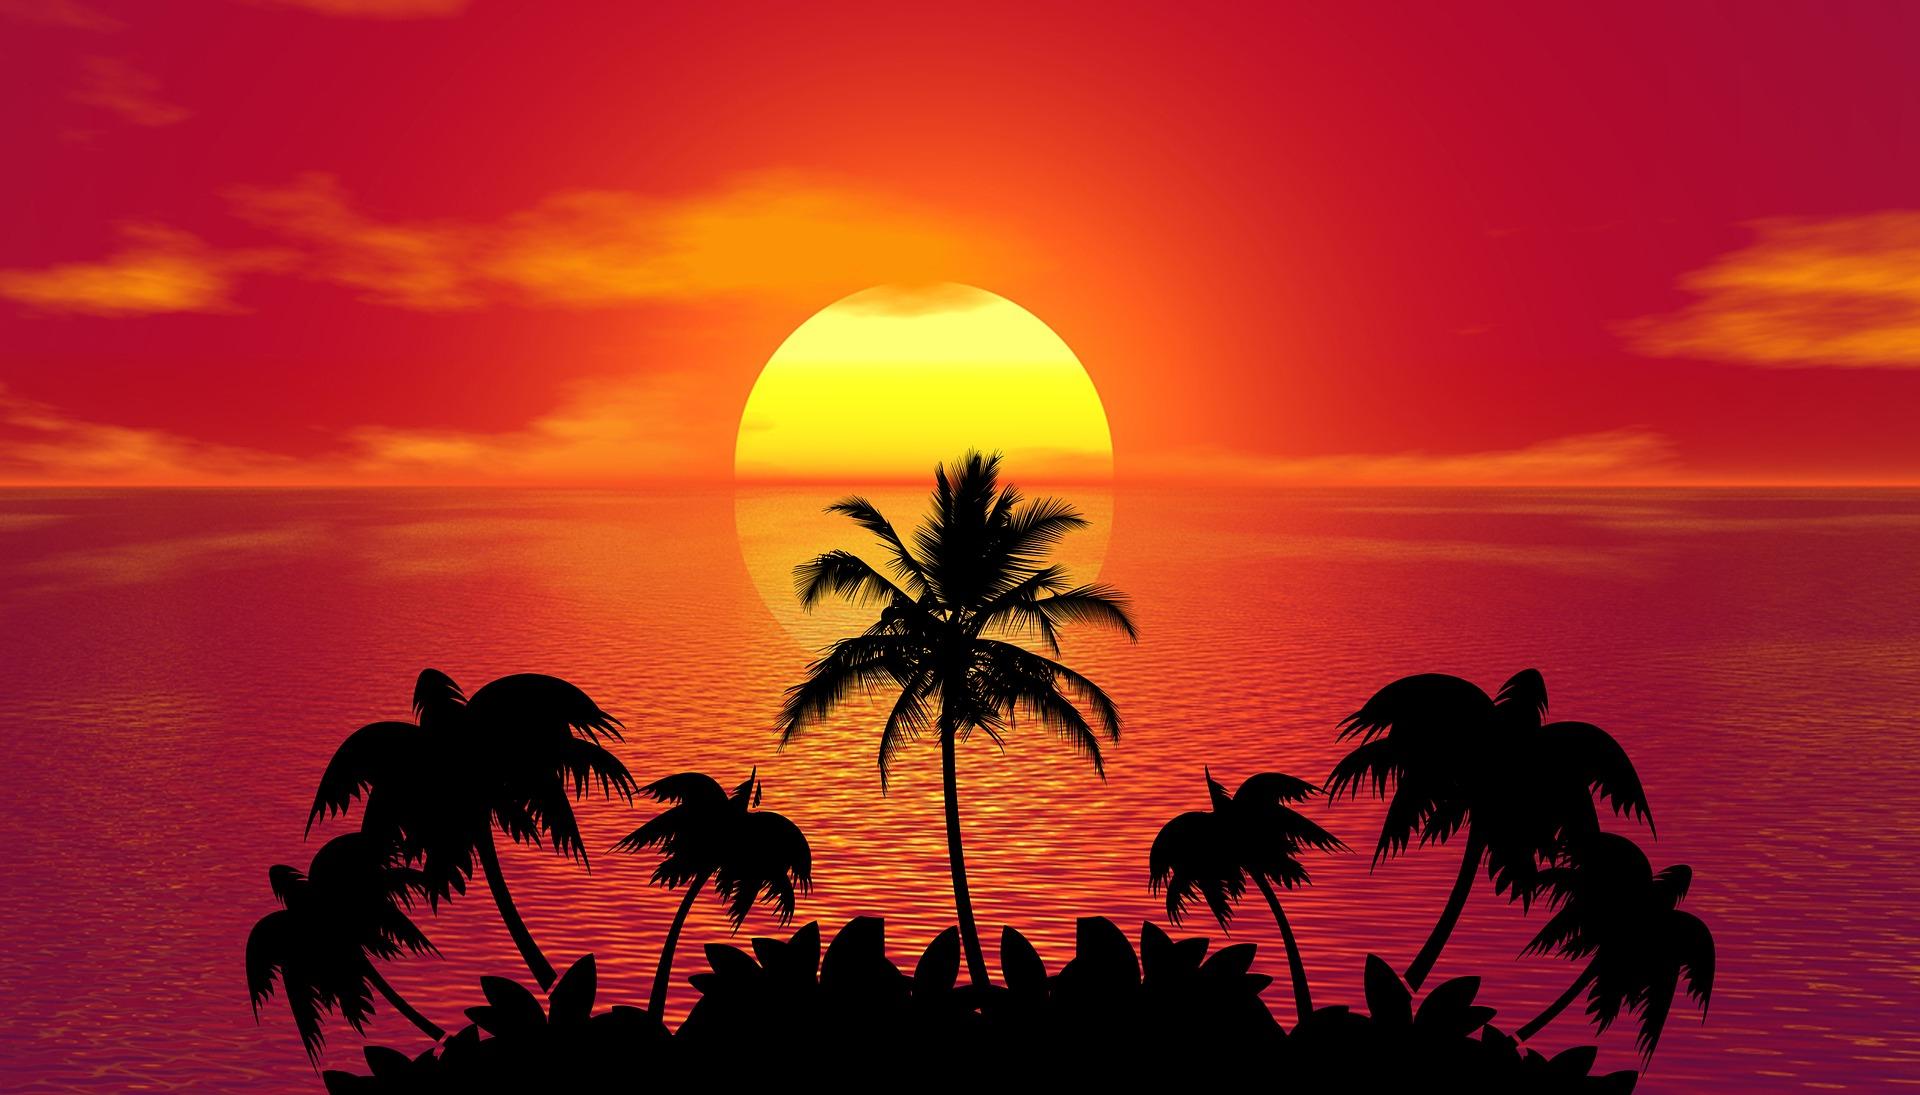 sunset-1651426_1920